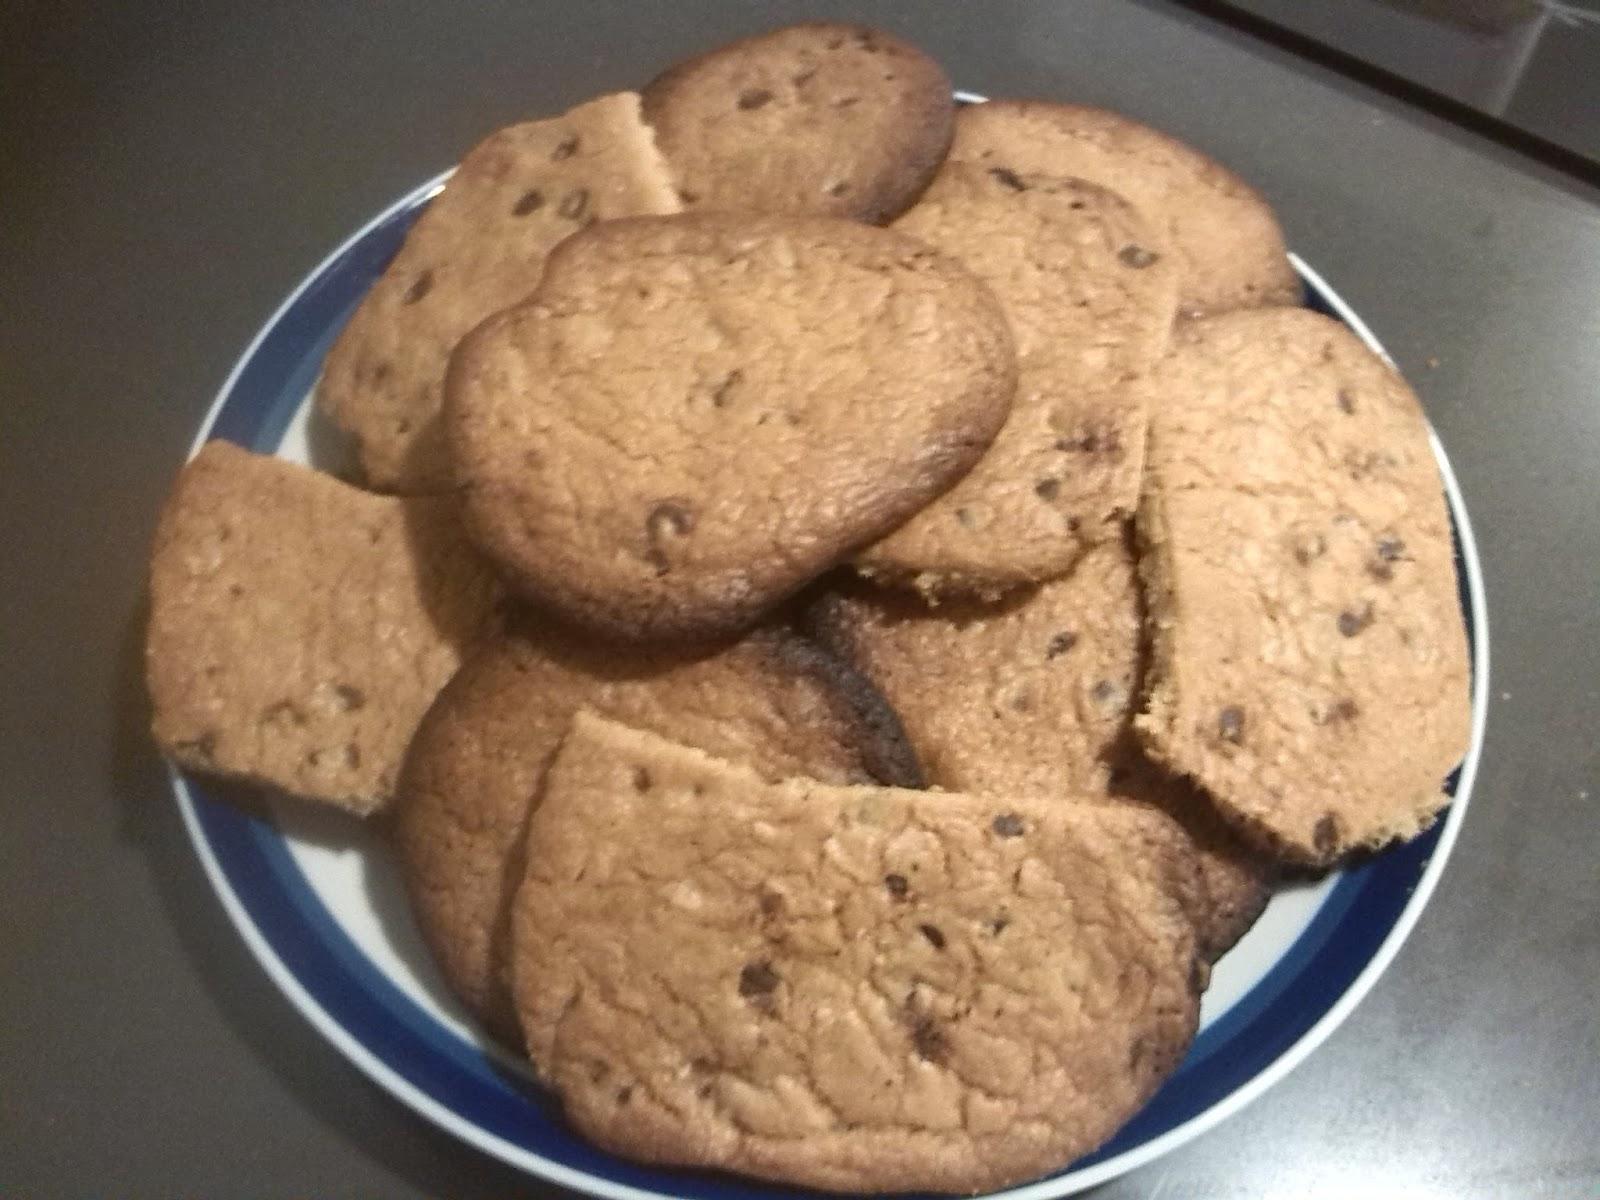 http://lashermanasyunamarx.blogspot.com.es/2014/10/cookies.html